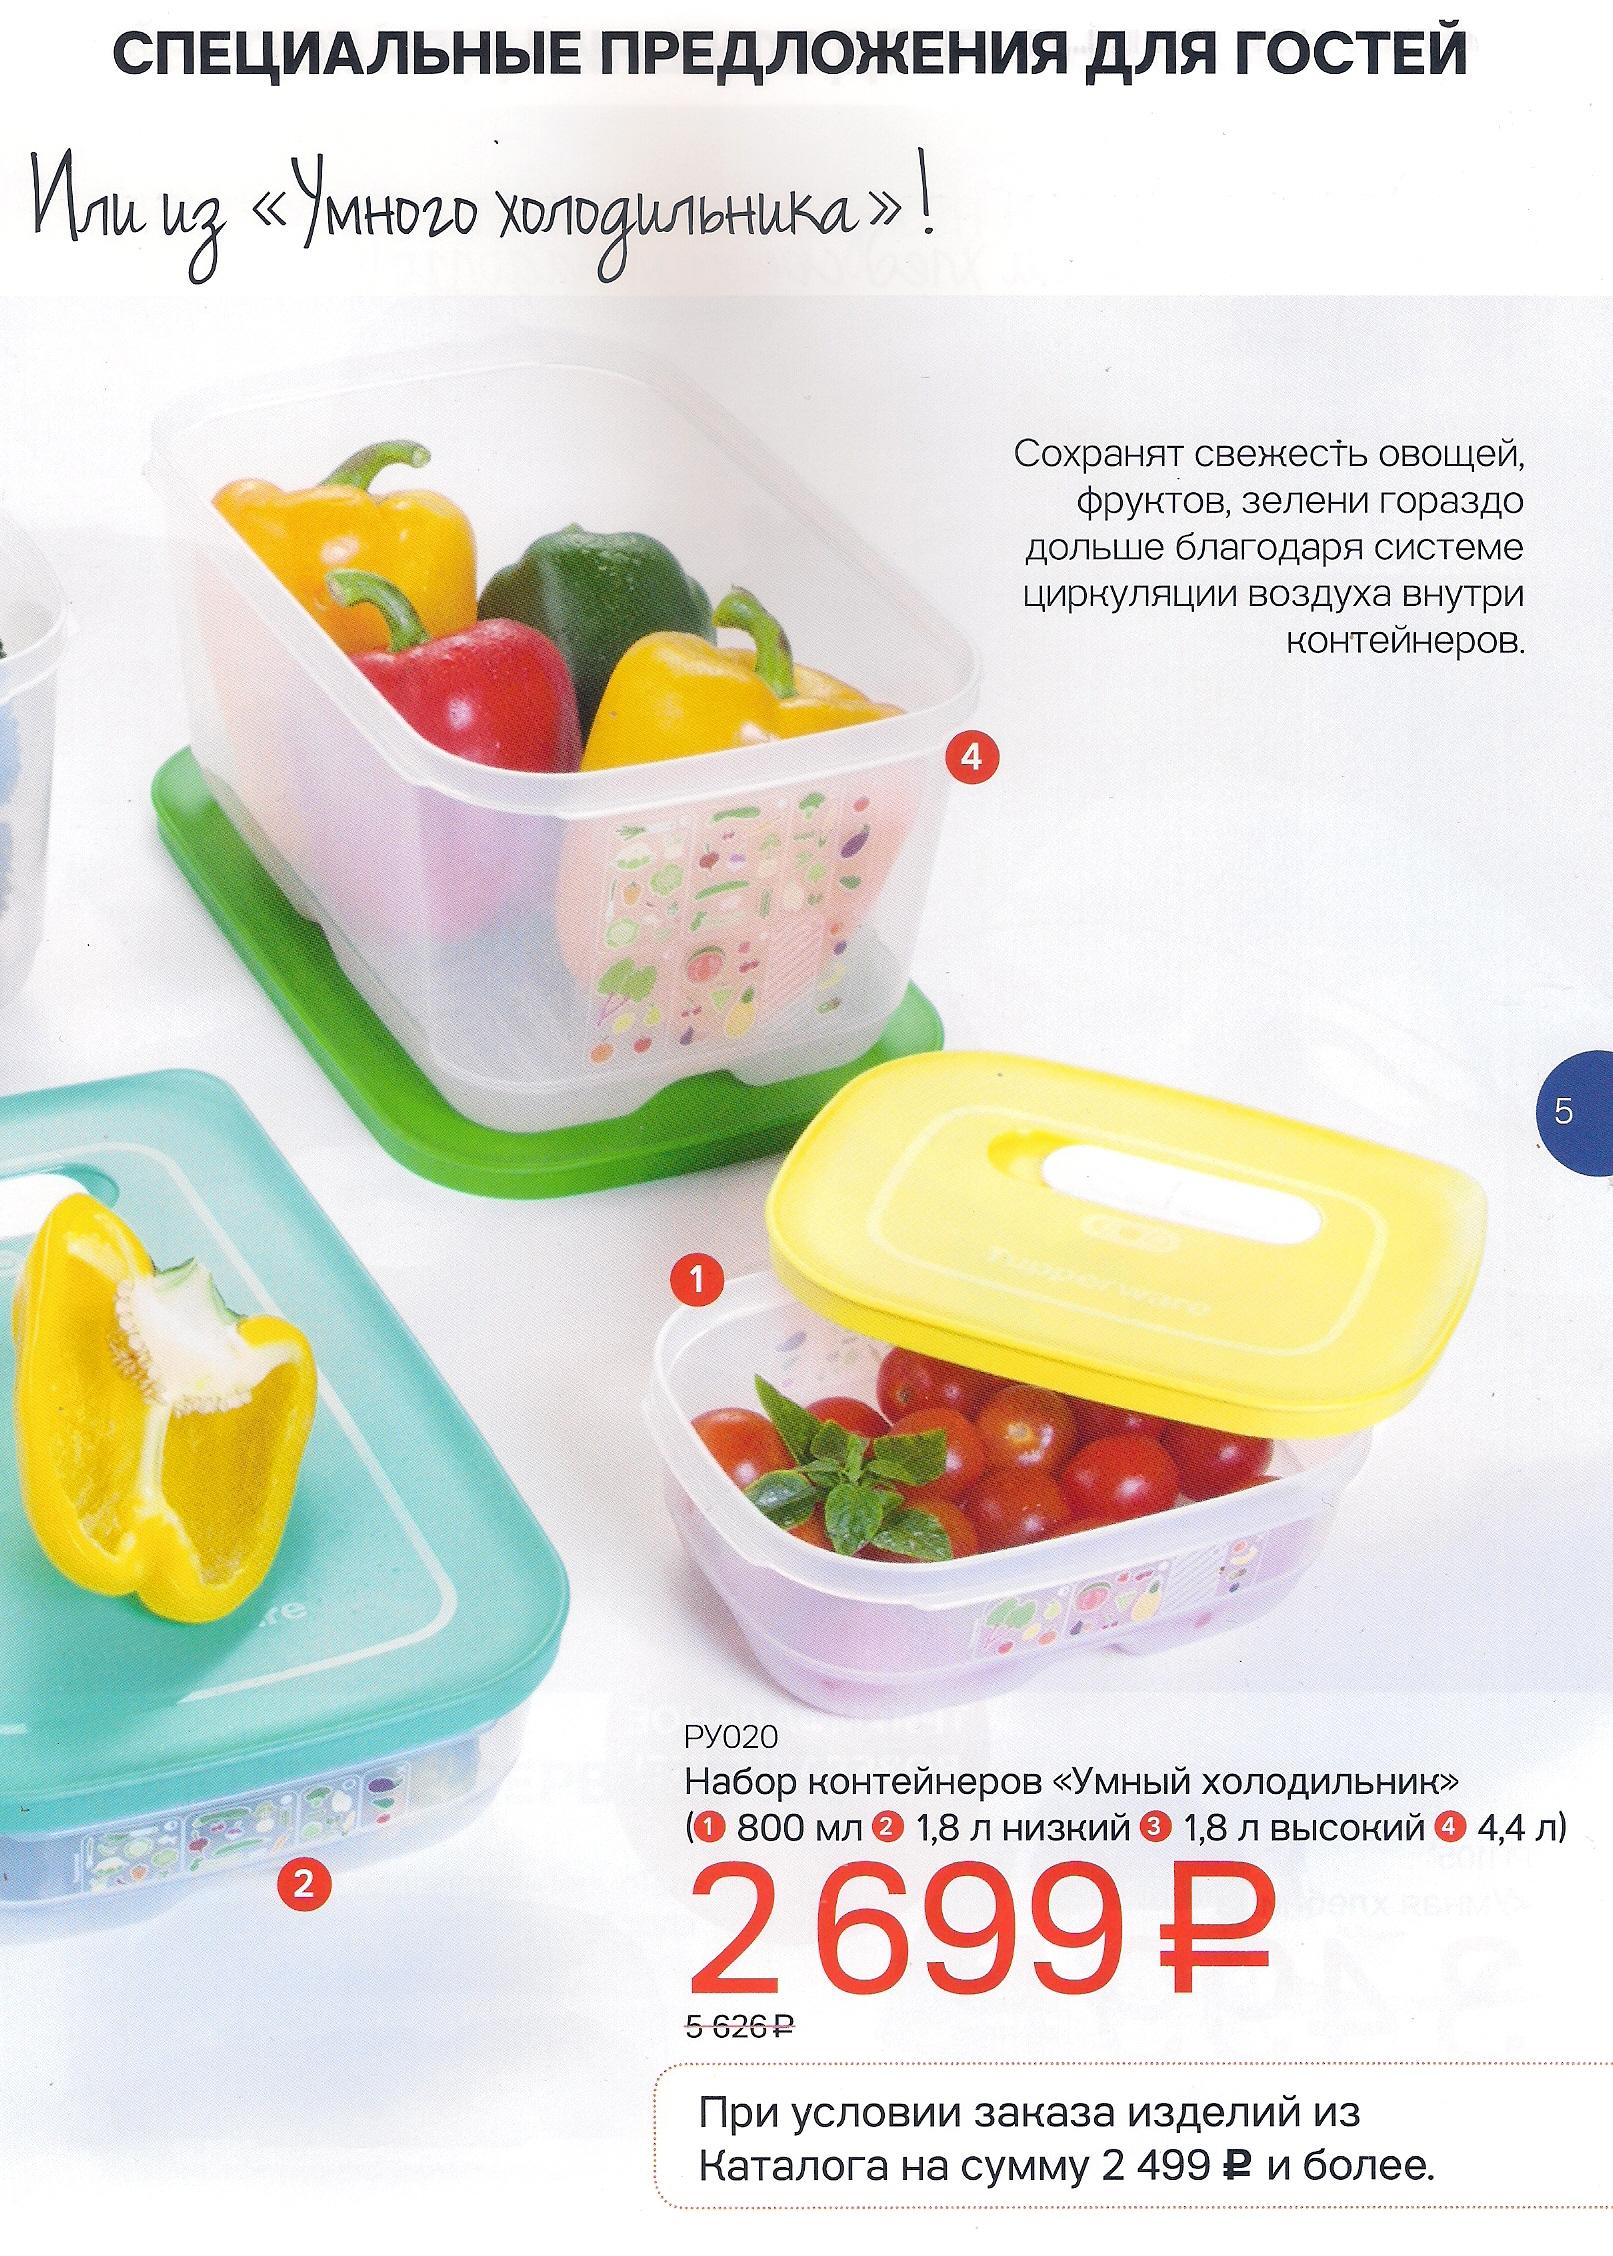 https://tupperware-online.ru/images/upload/4l.jpg